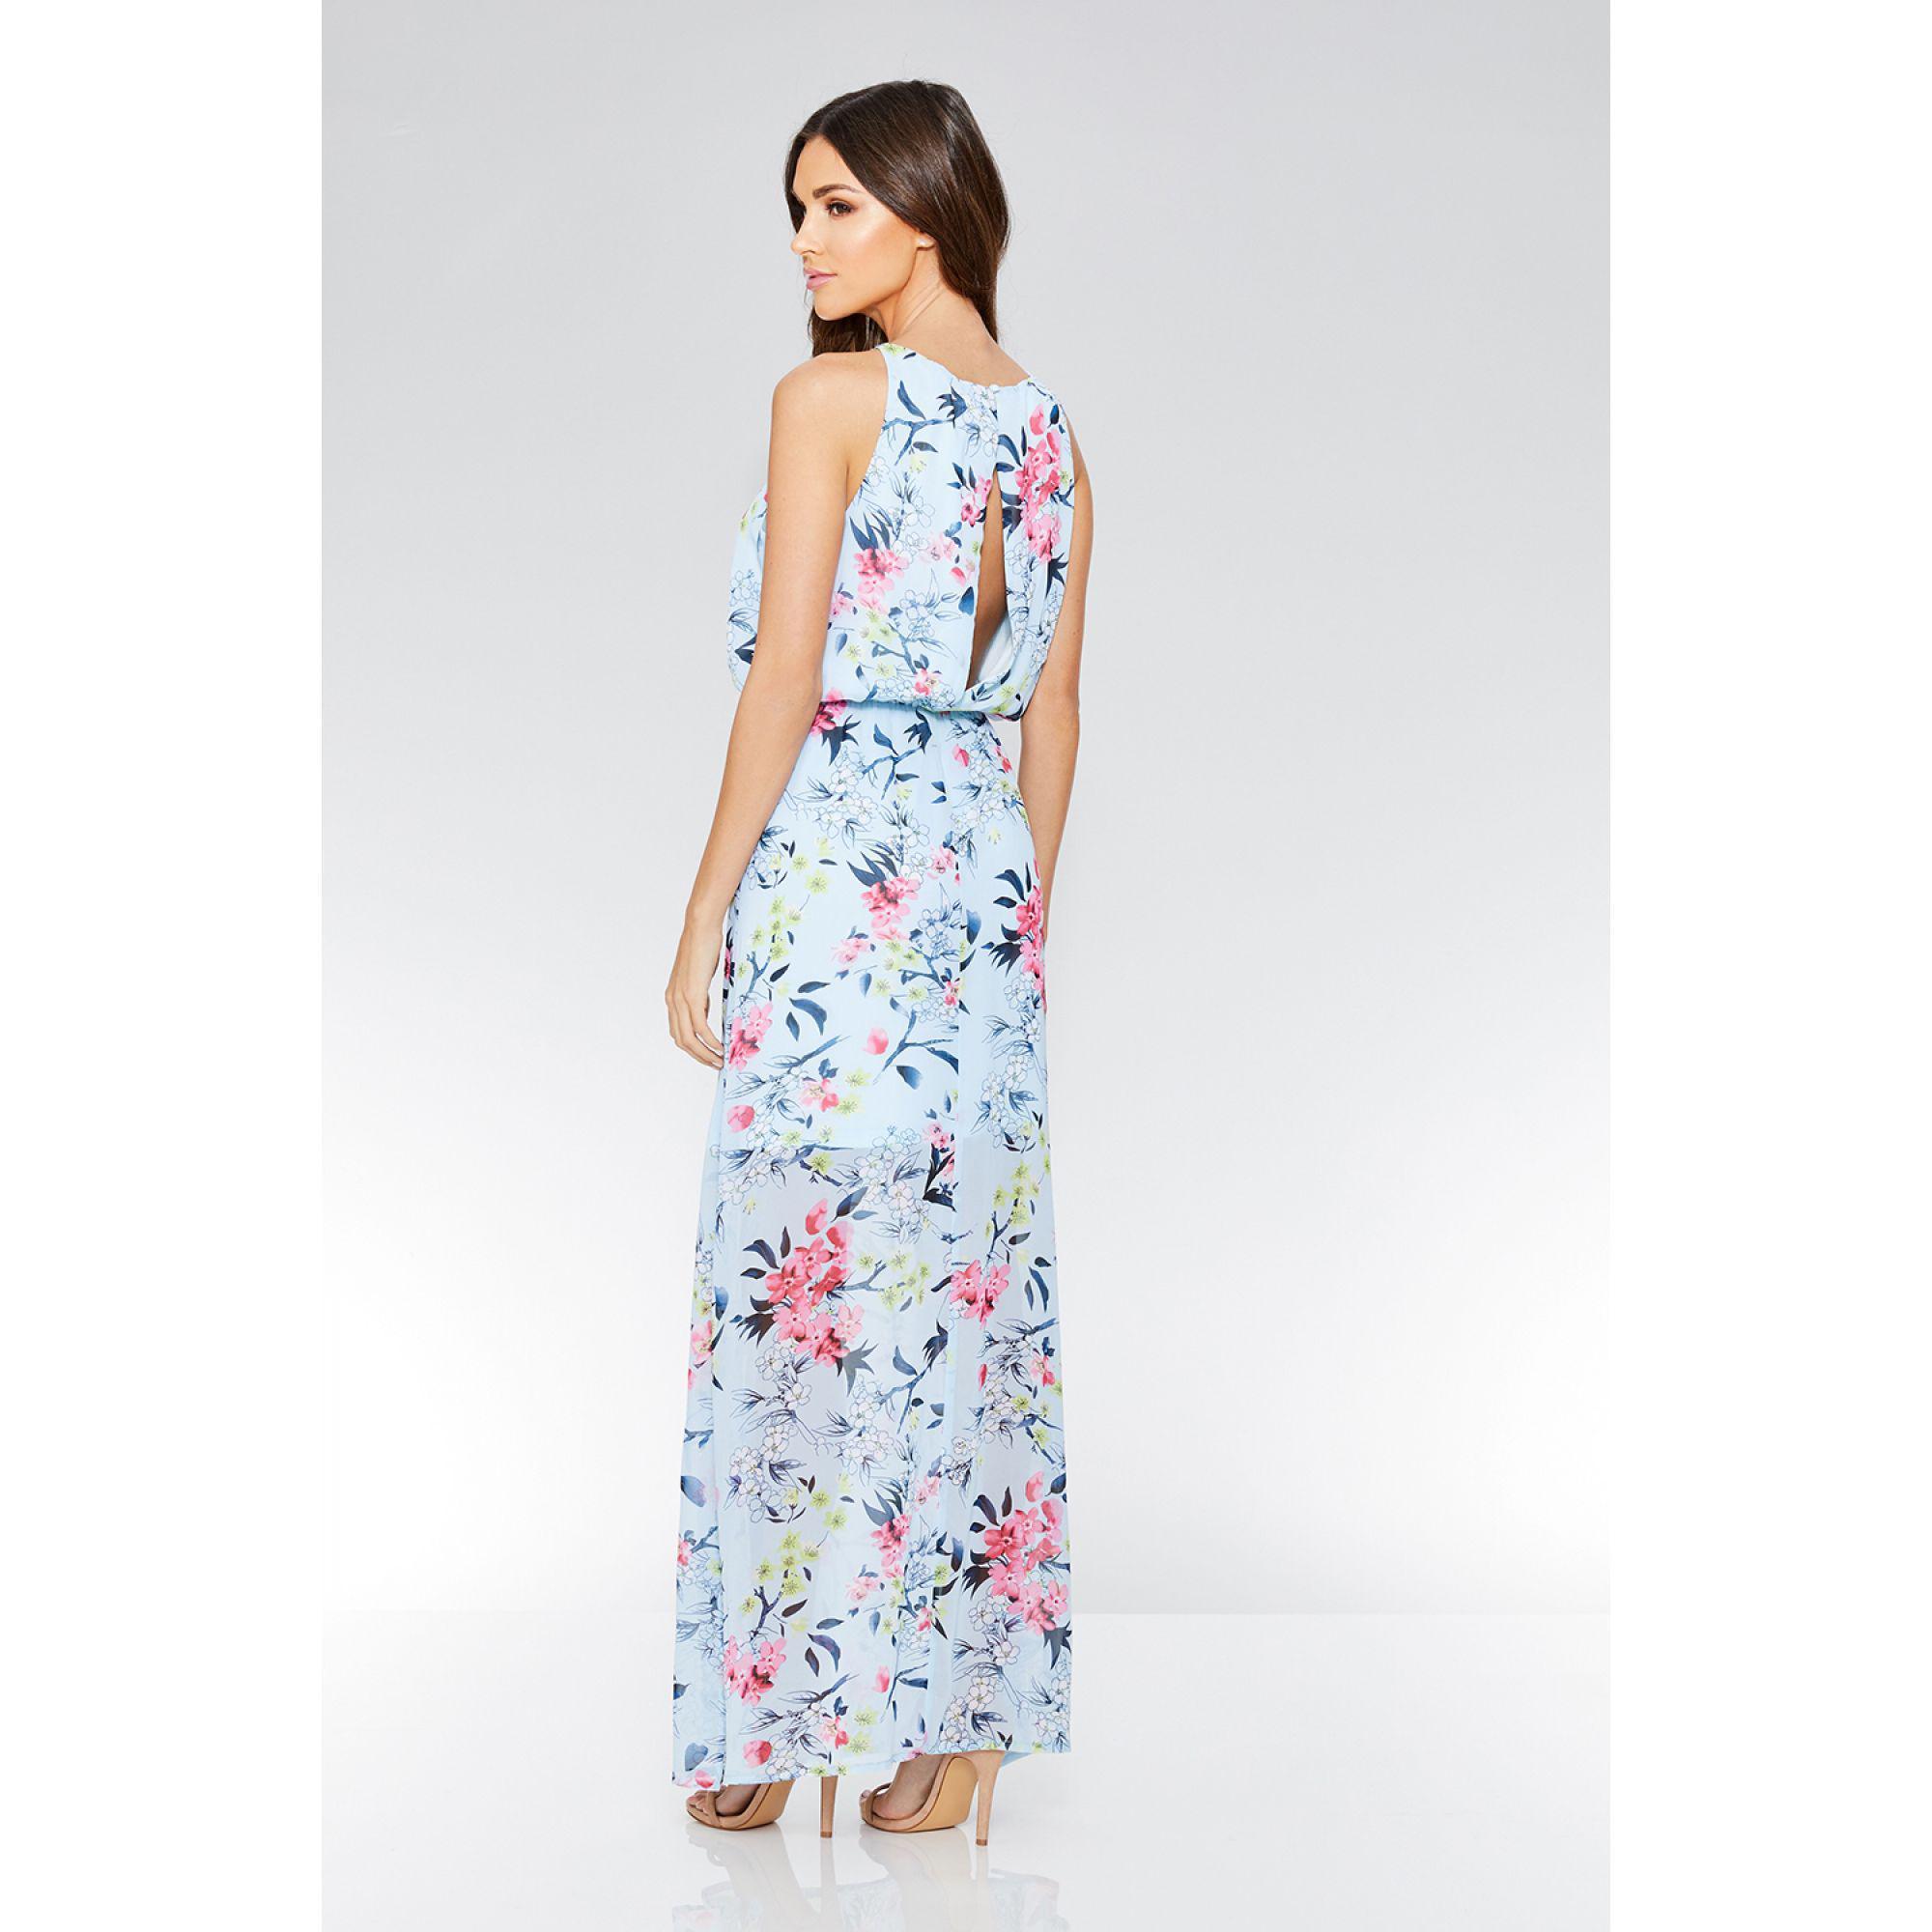 4e09a2b2db Quiz - Blue Floral Print Chiffon High Neck Sleeveless Maxi Dress - Lyst.  View fullscreen